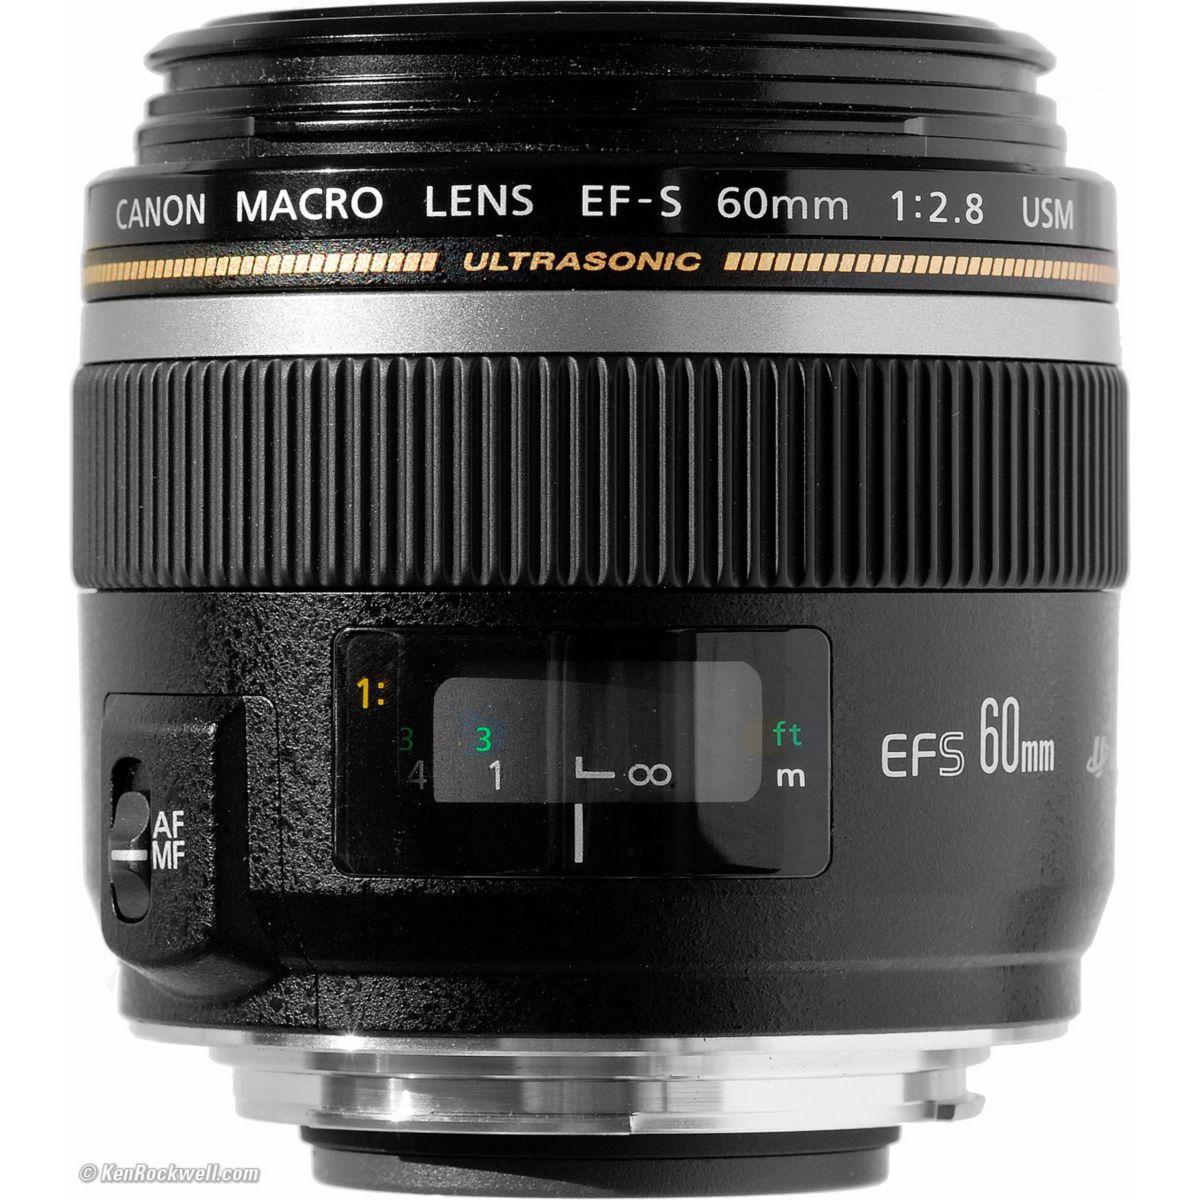 Objectif pour reflex canon ef-s 60mm f2.8 macro usm